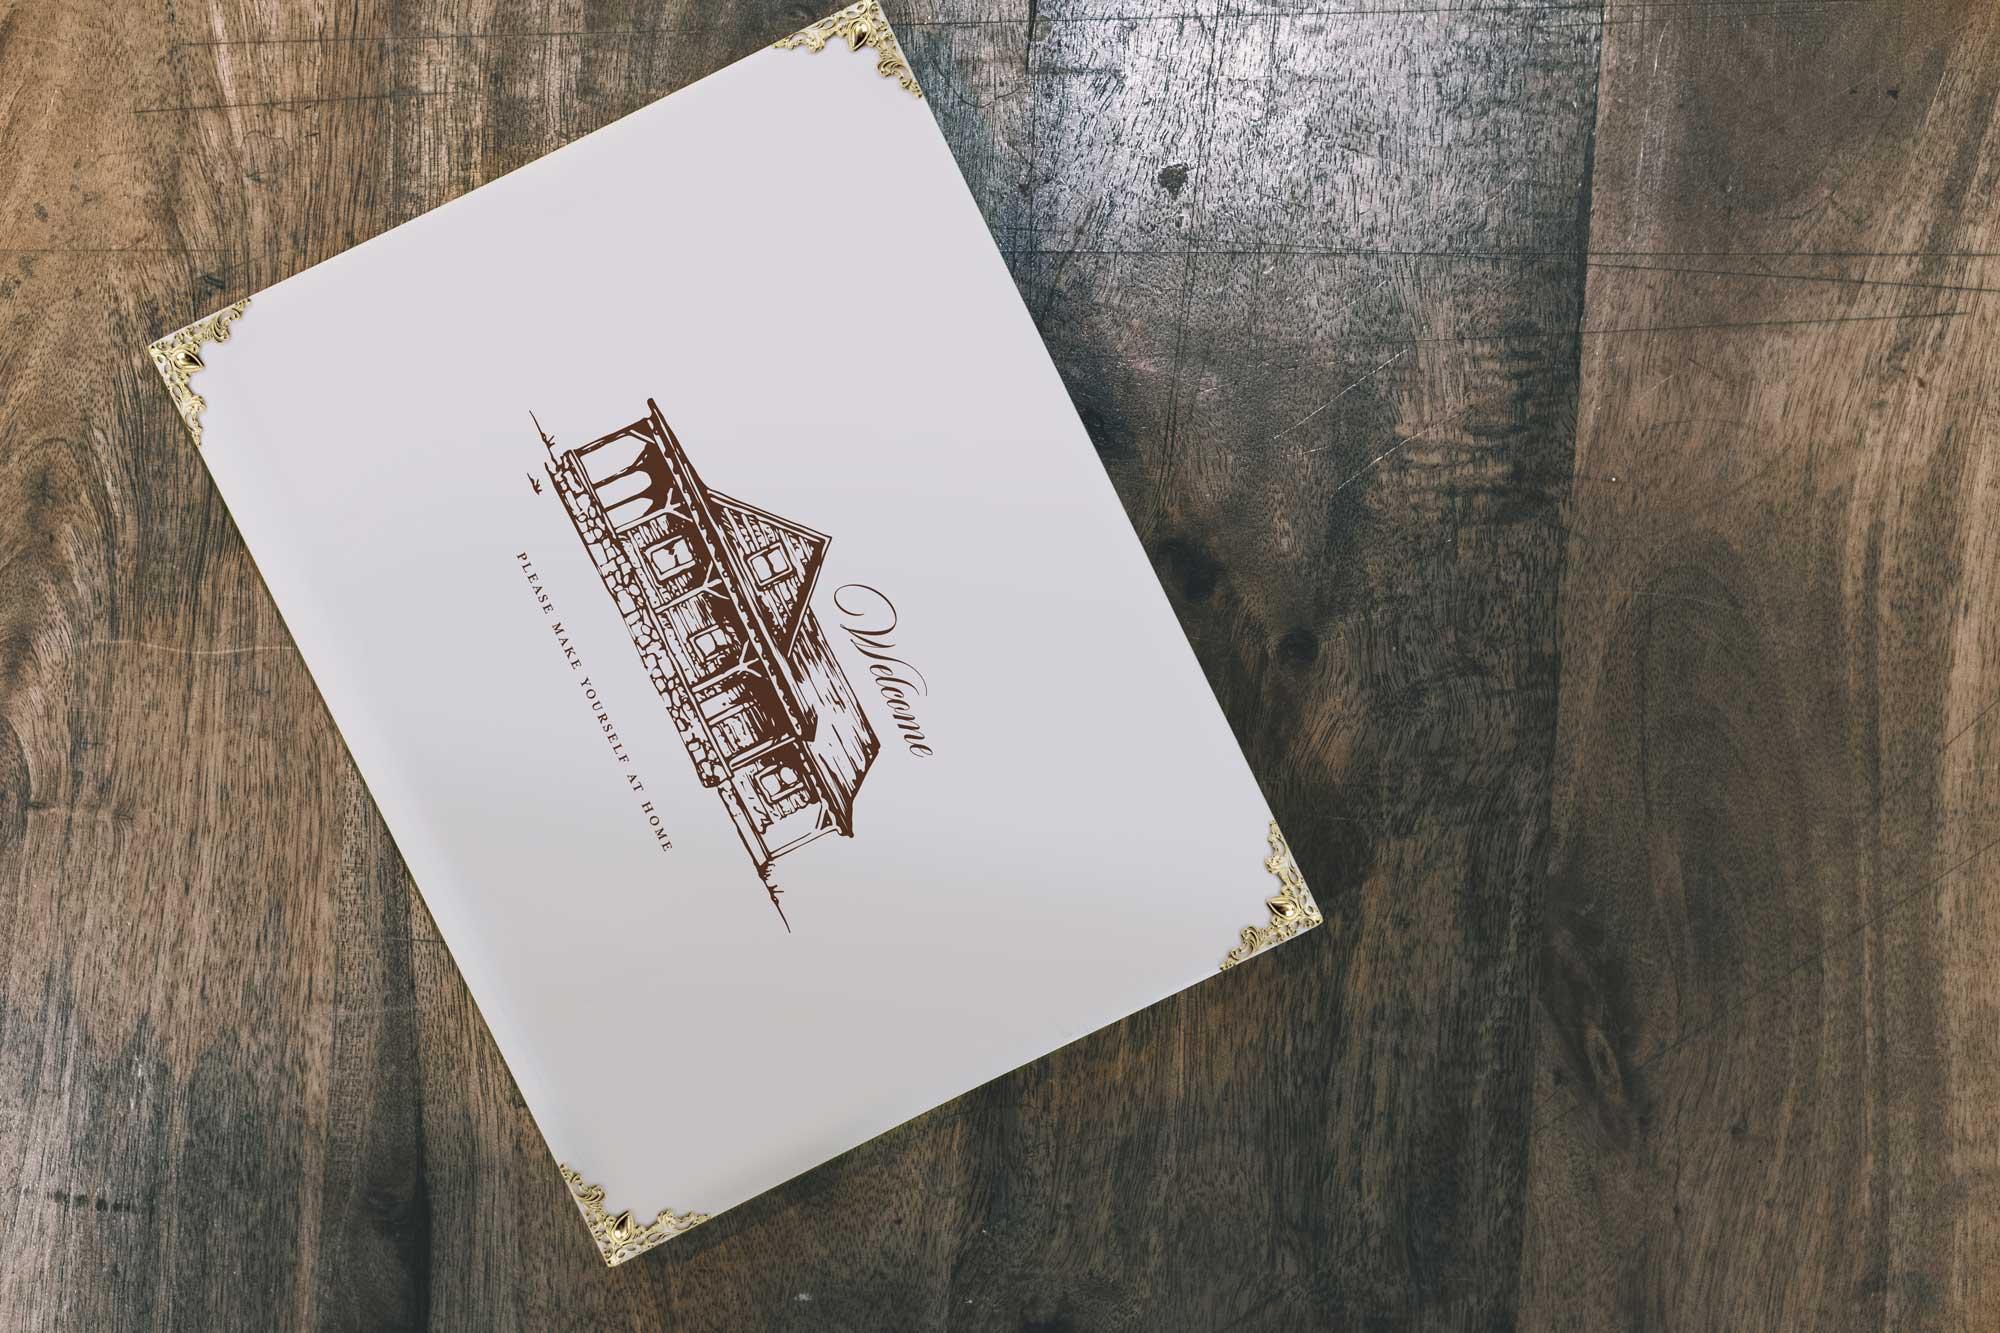 Beechwood-ranch-welcome-book.jpg